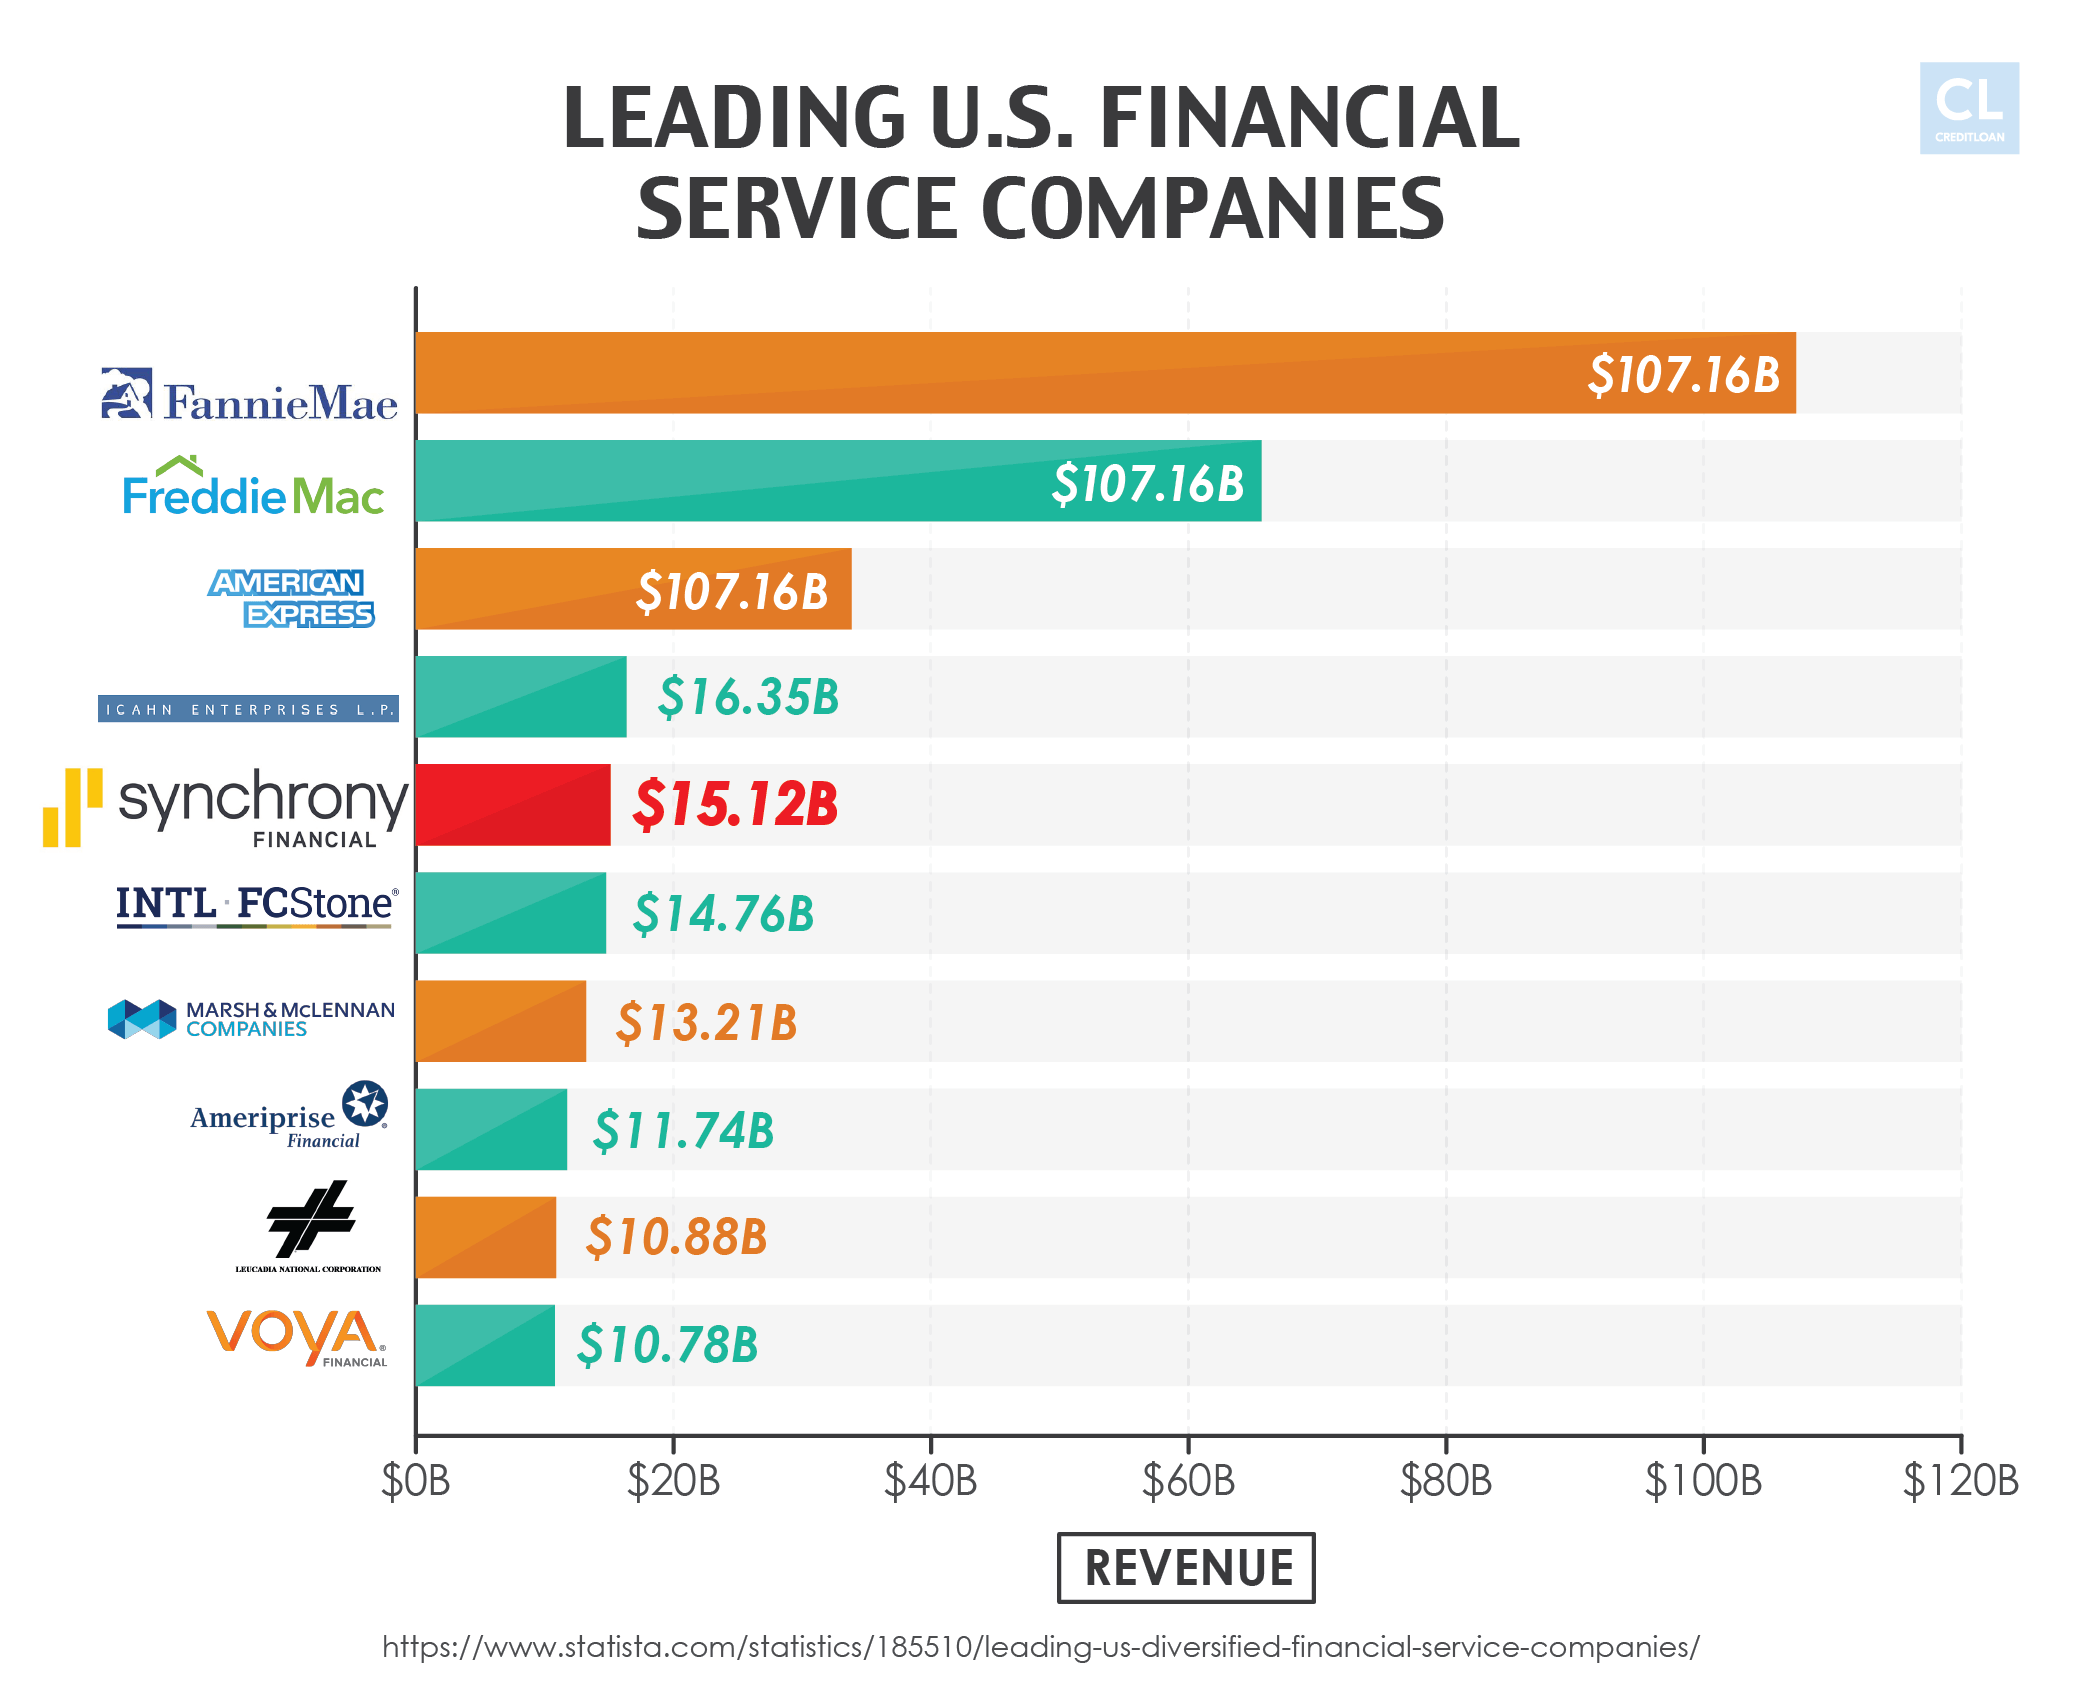 Leading U.S. Financial Service Companies